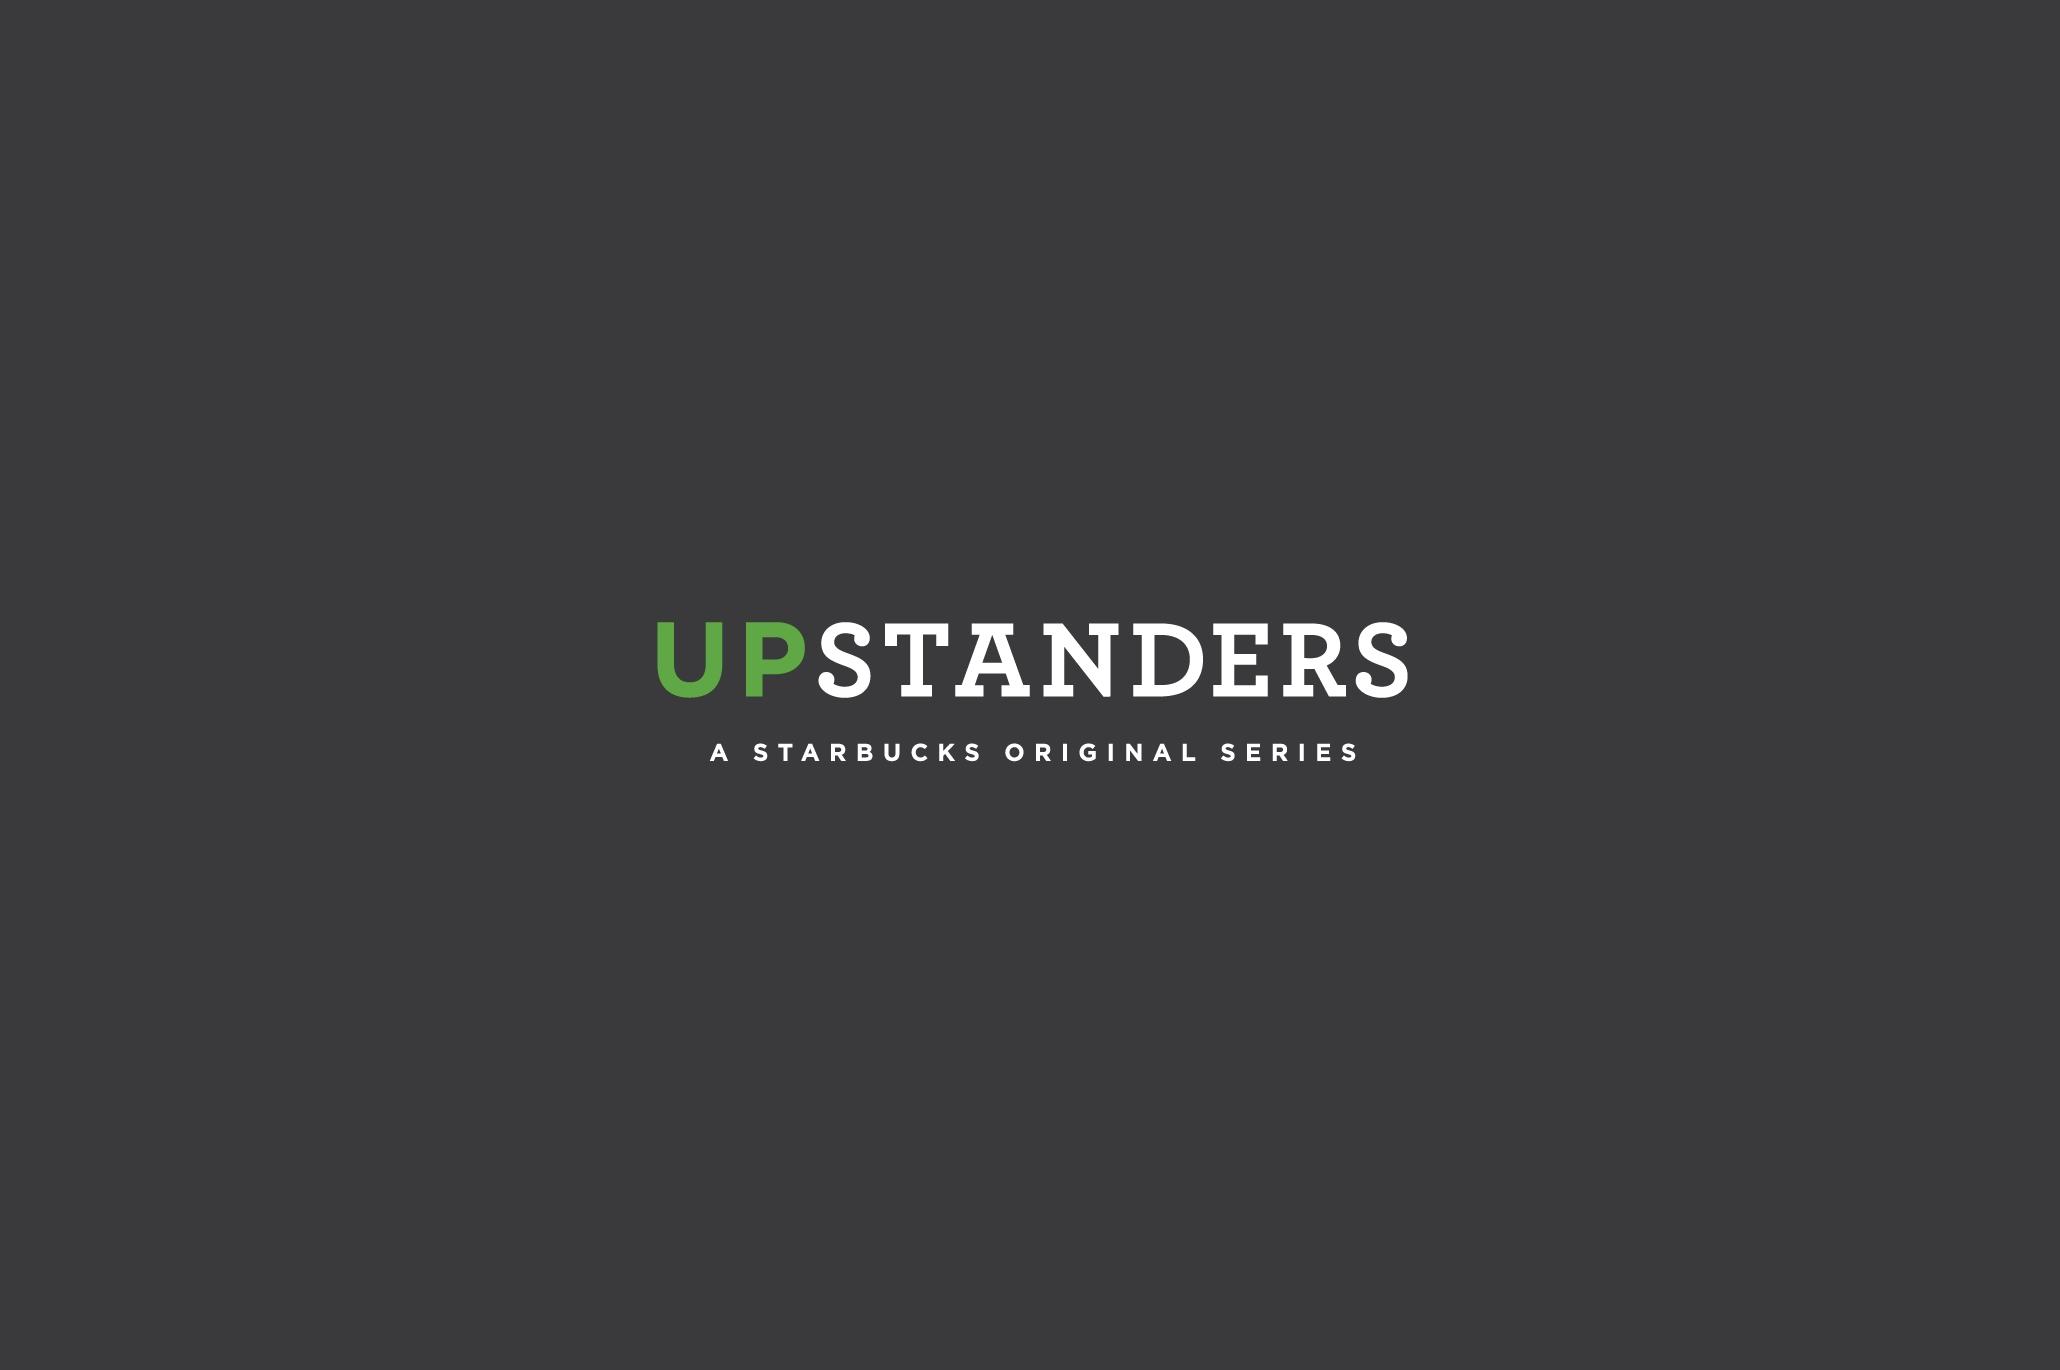 Upstander-Title-Black.jpg